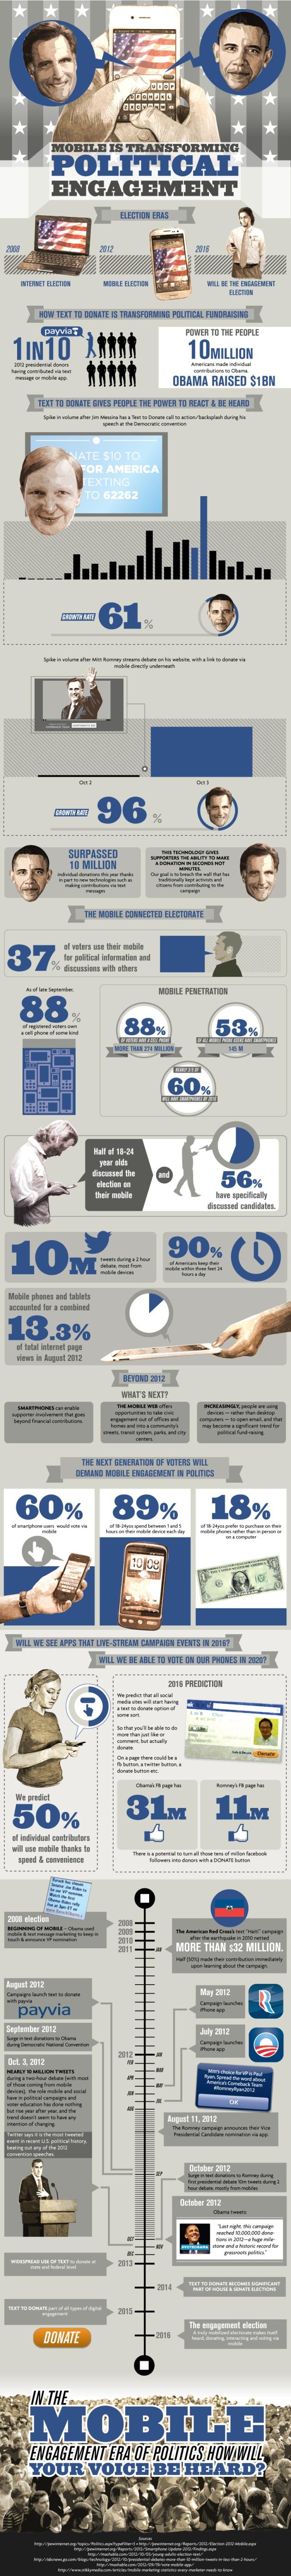 mobile election politics 2012 infographic